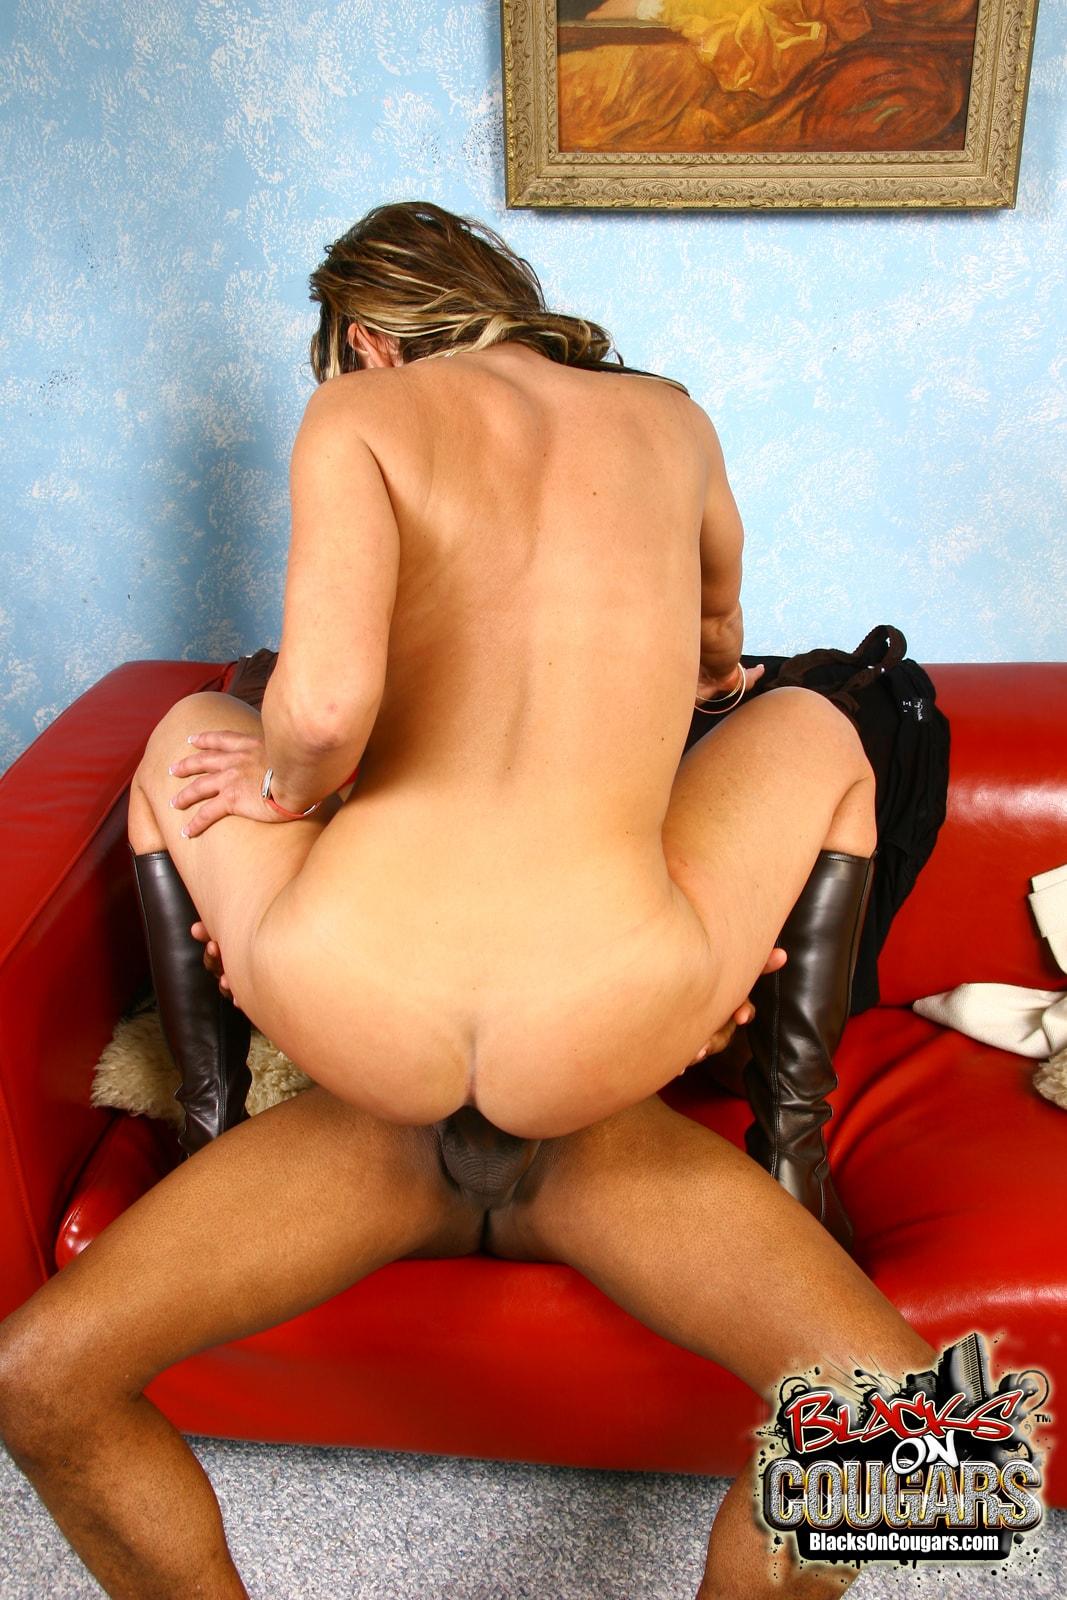 Dogfart '- Blacks On Cougars' starring Kelly Leigh (Photo 24)